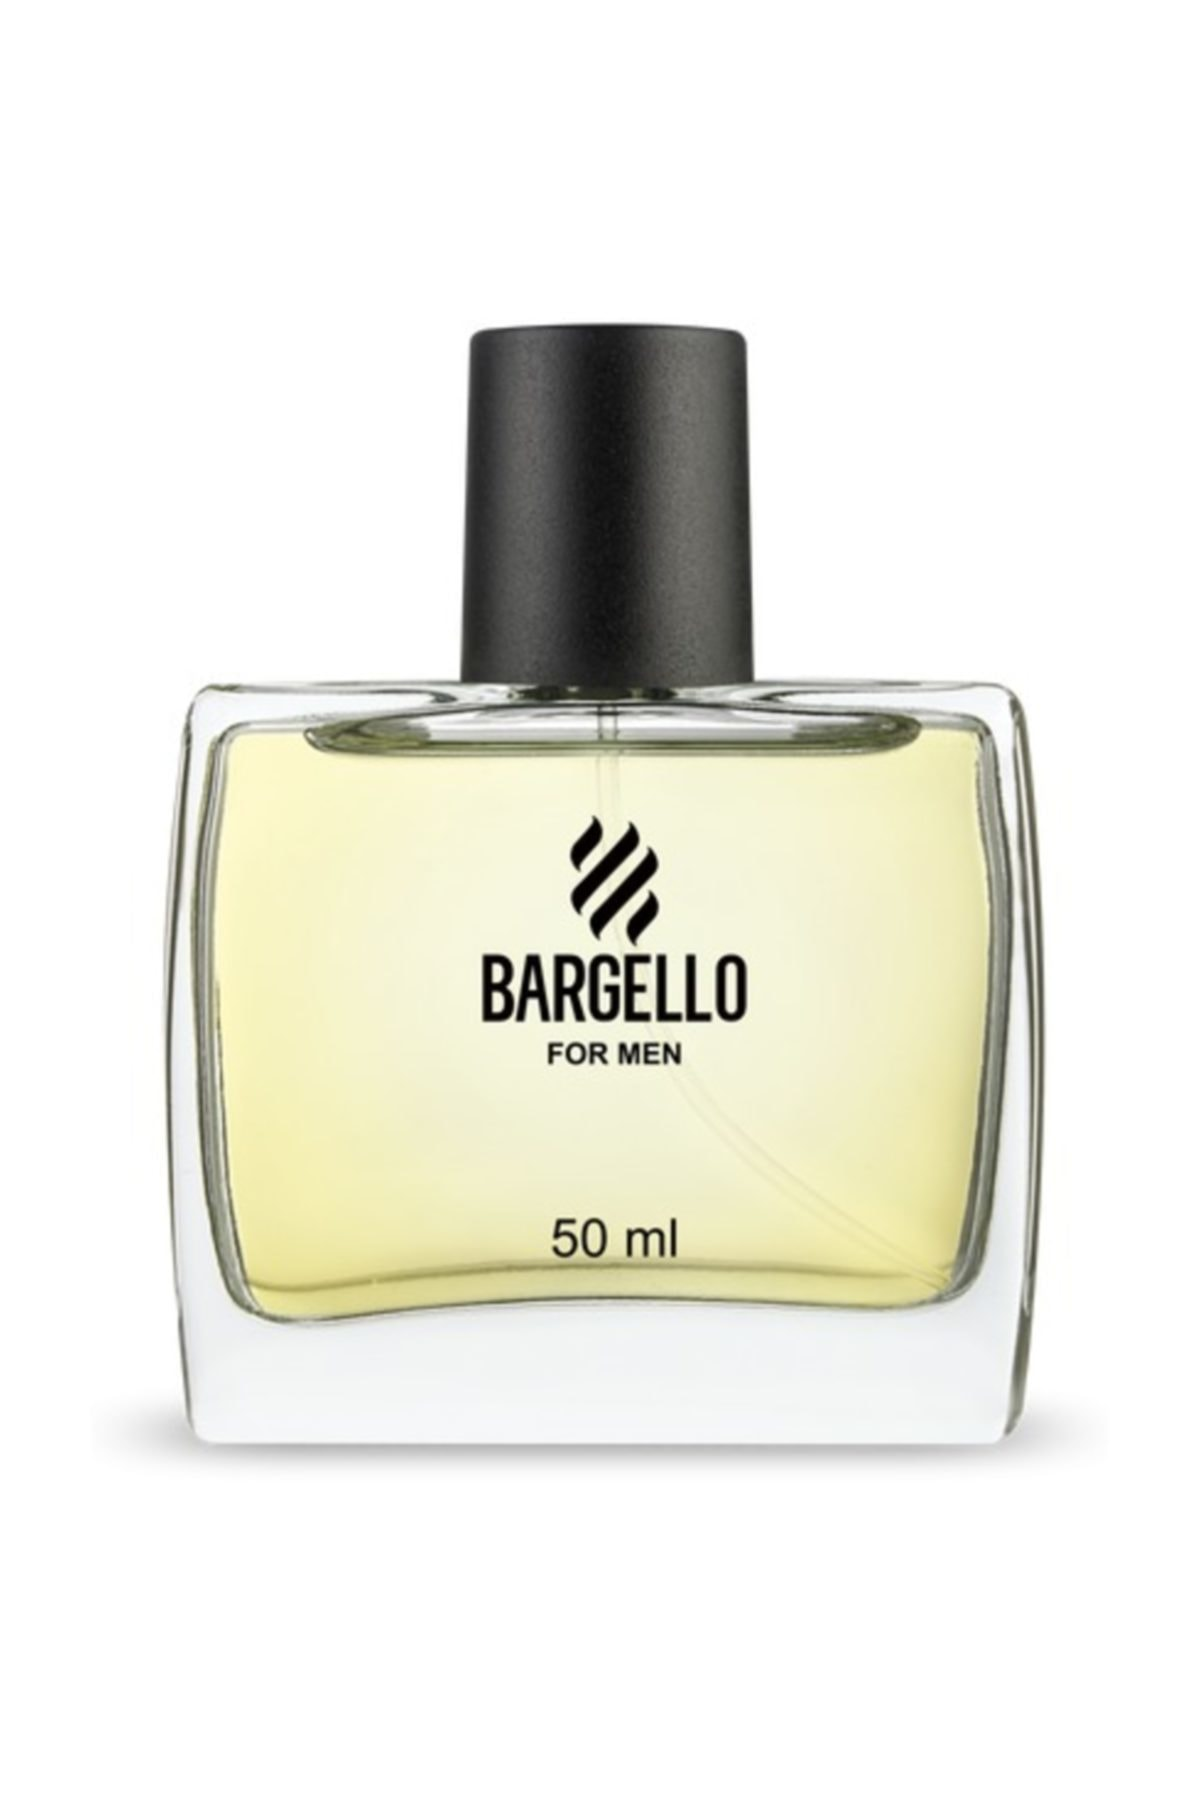 Bargello ERKEK PARFÜM 514 ORİENTAL 50 ML EDP 1